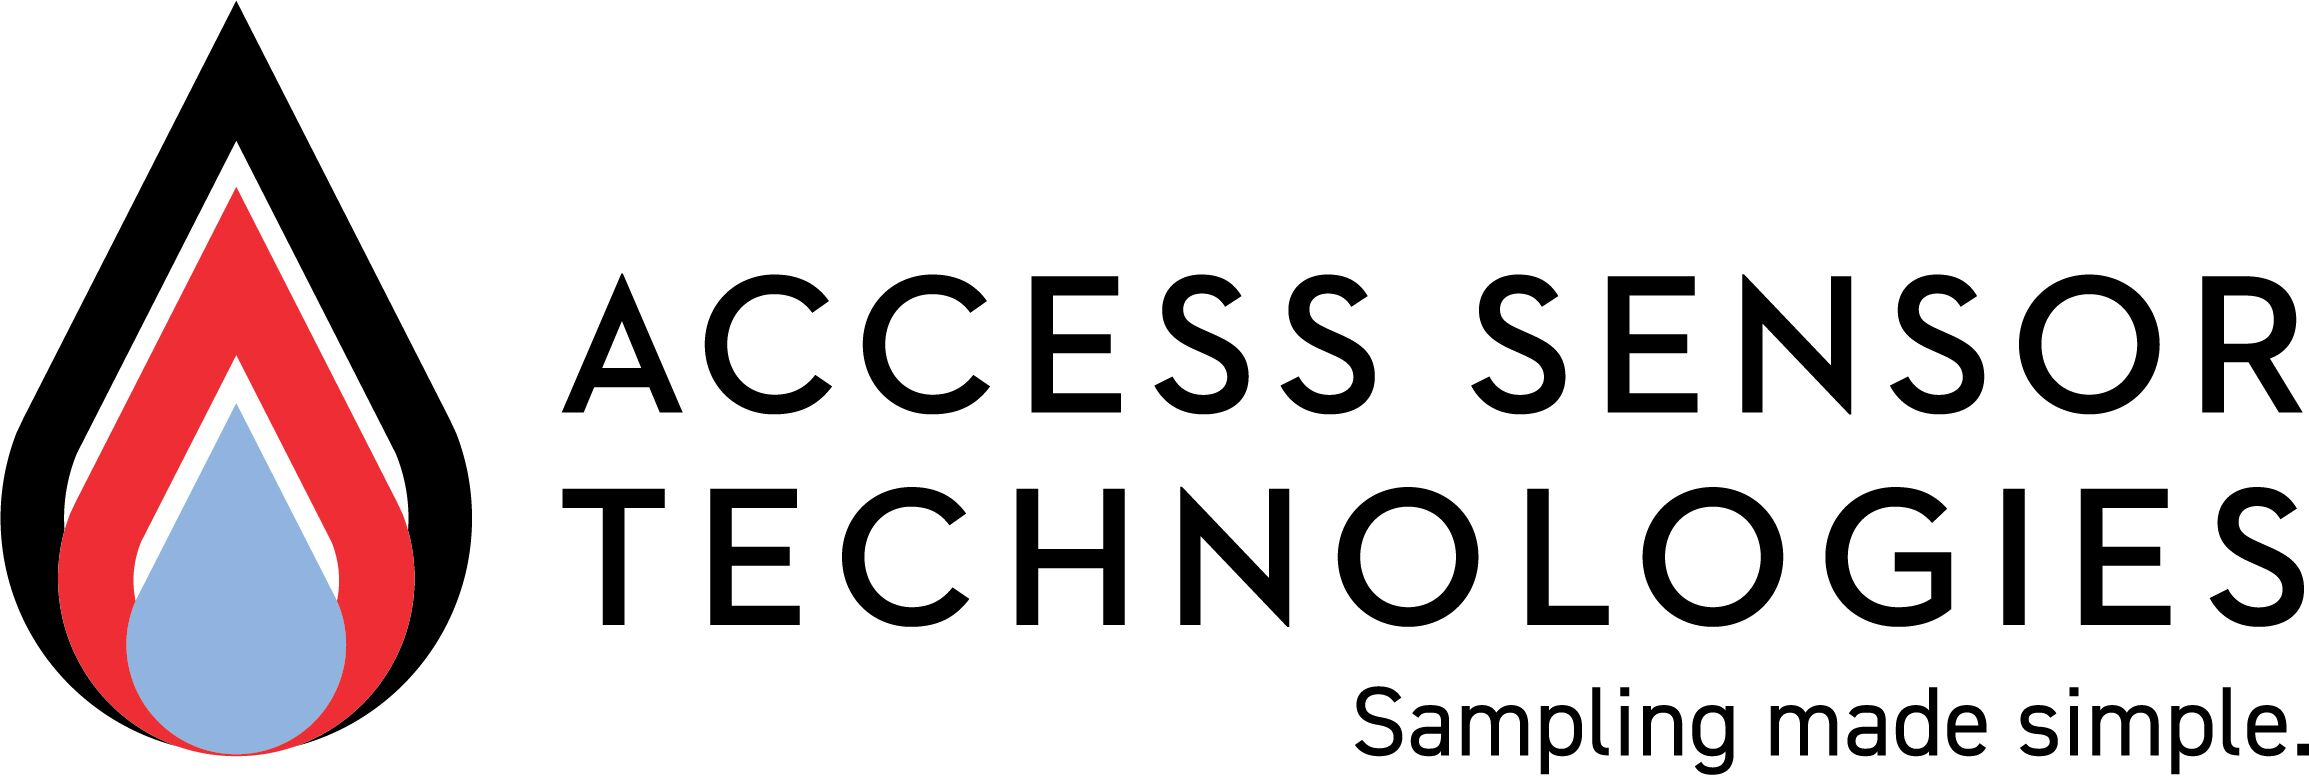 new logo.jpeg